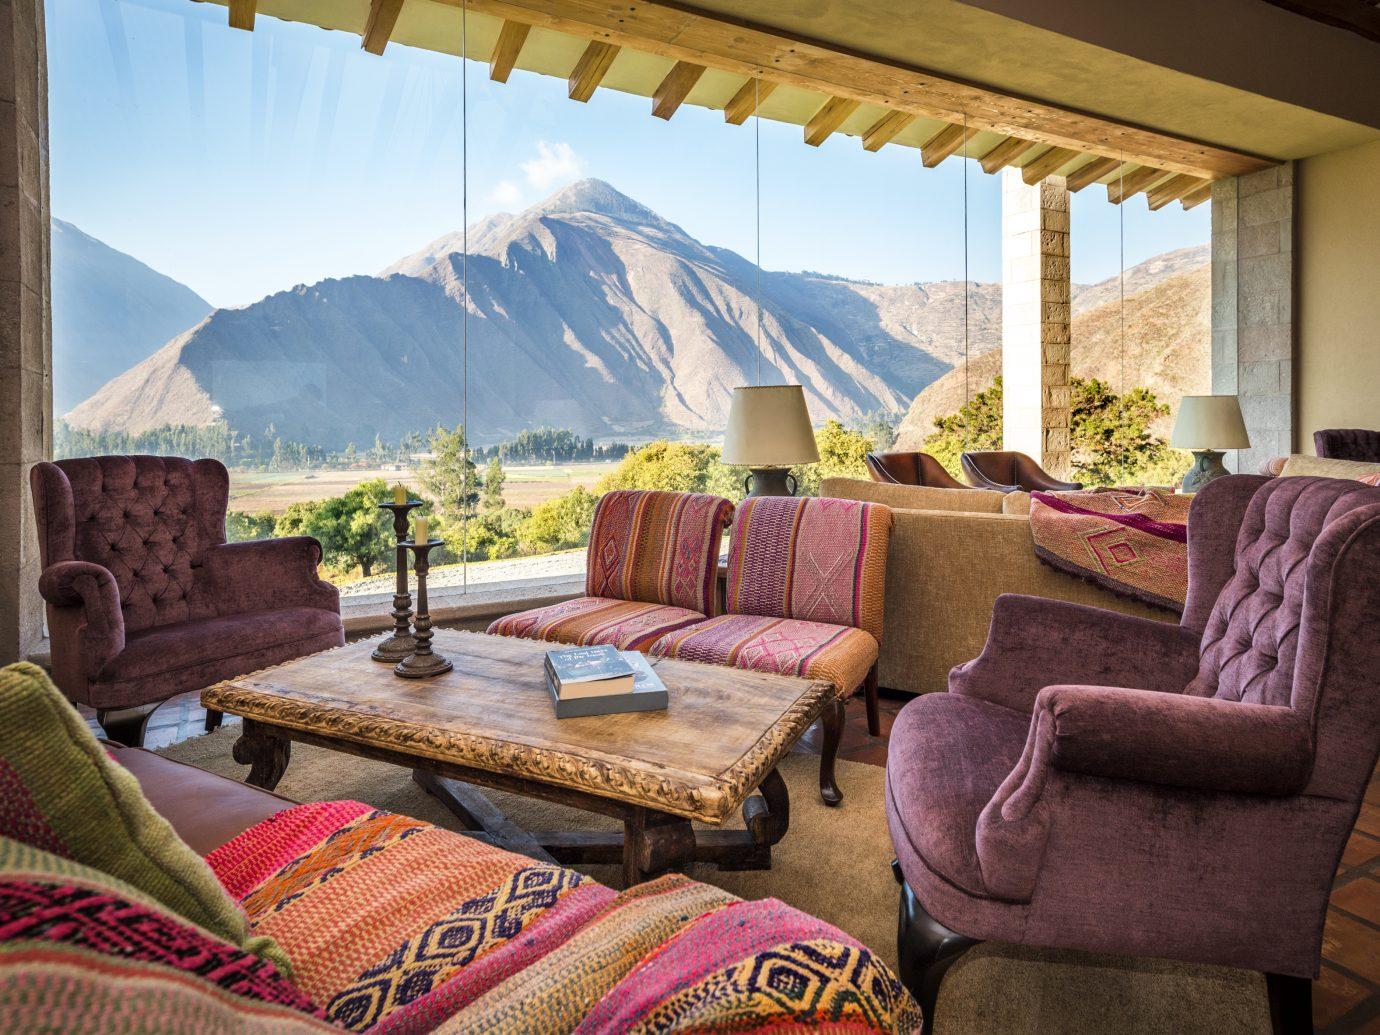 view of mountain from the living room at inkaterra hacienda urubamba